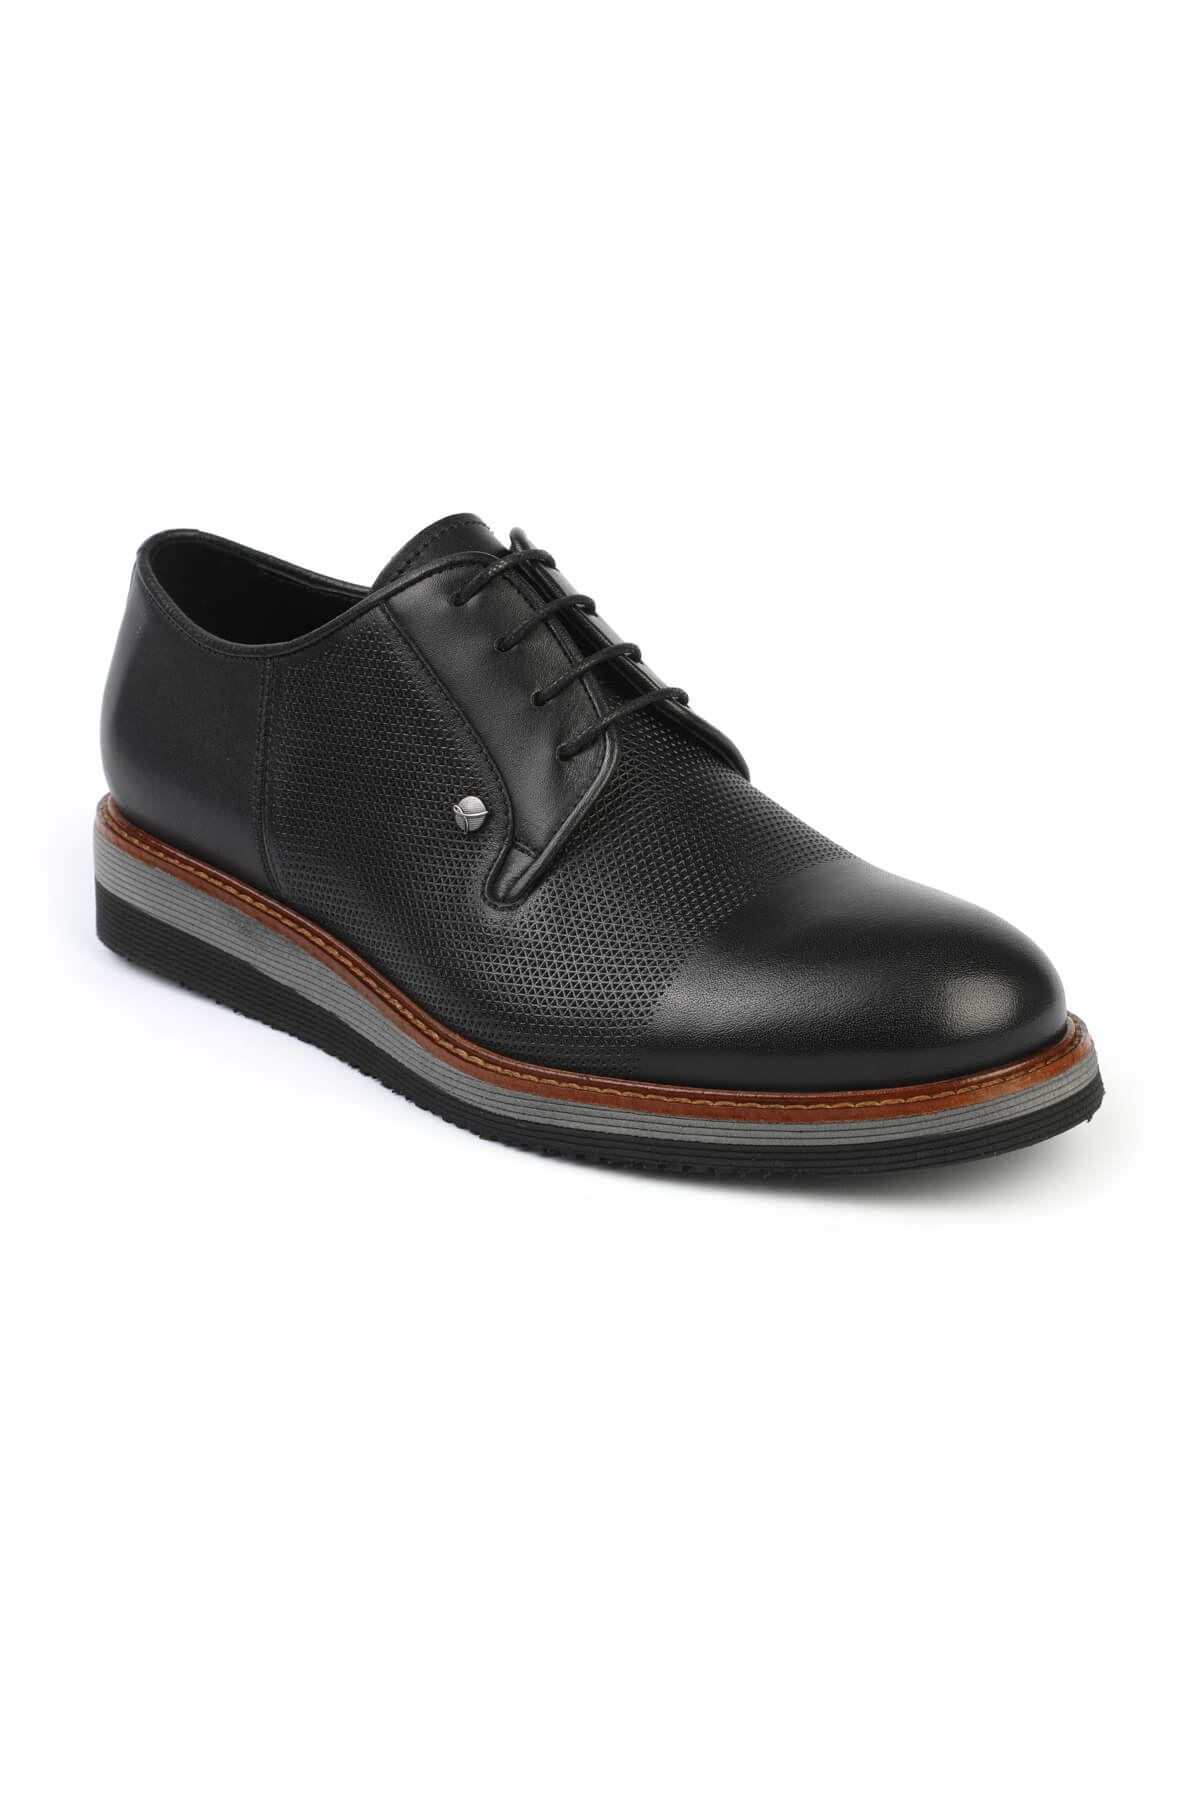 Libero 3052 Black Oxford Shoes